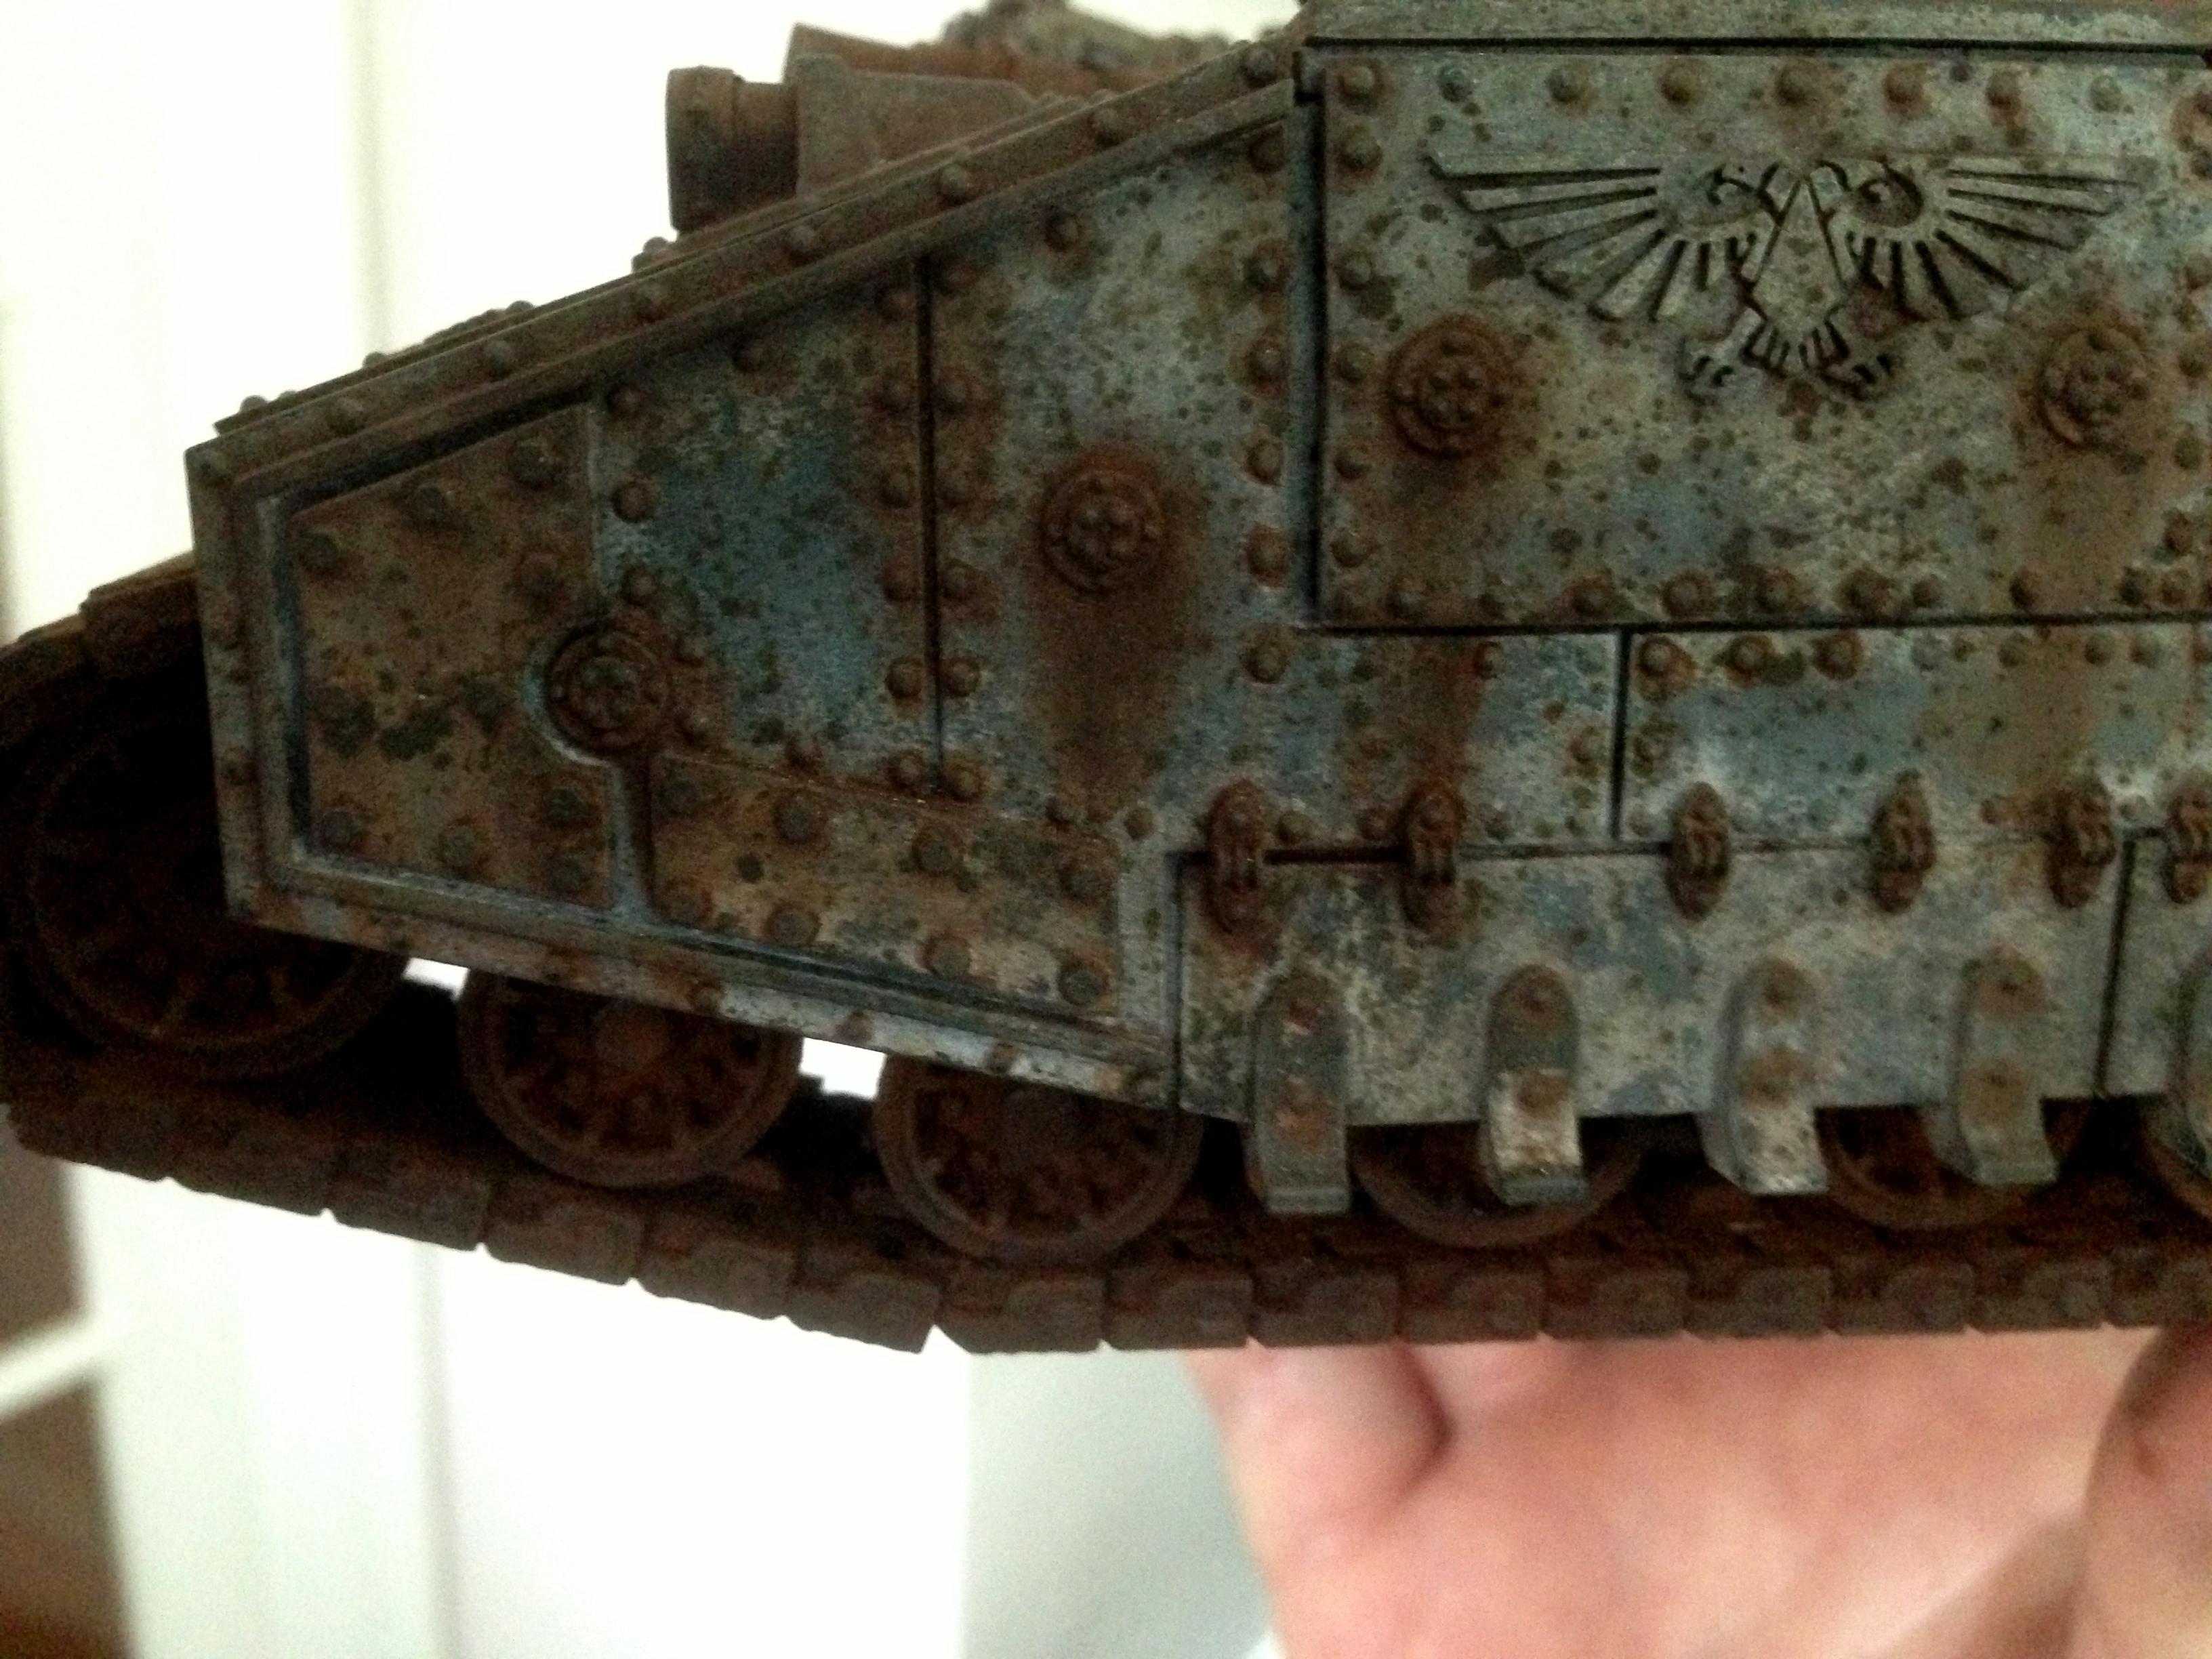 Astra Militarum, Baneblade, Corrosion, Imperial Guard, Rust, Super-heavy